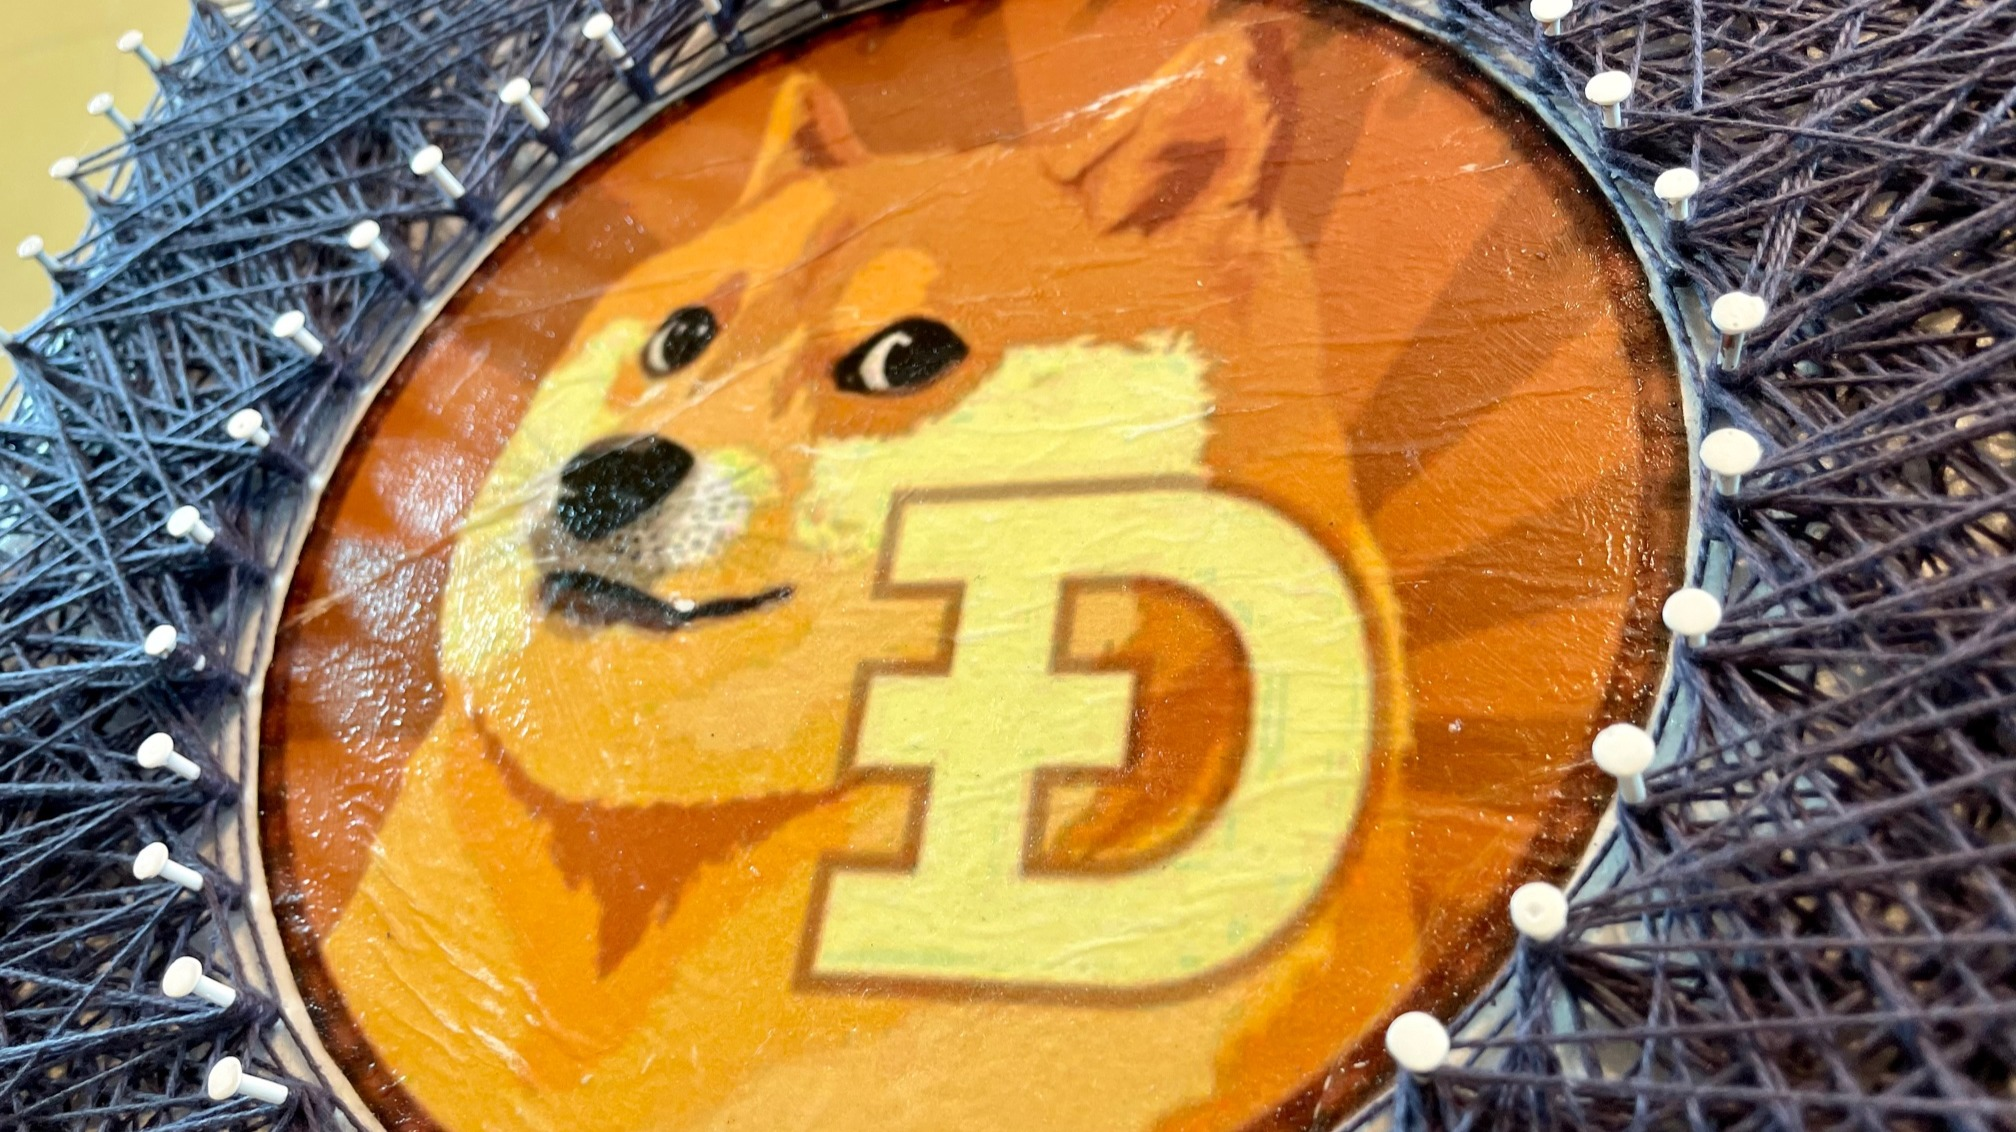 DOGECOIN... Decoupage Nails and Twine !!(ENG/ITA)DOGECOIN ... Decoupagege Chioedi e Spago (Logo #3)